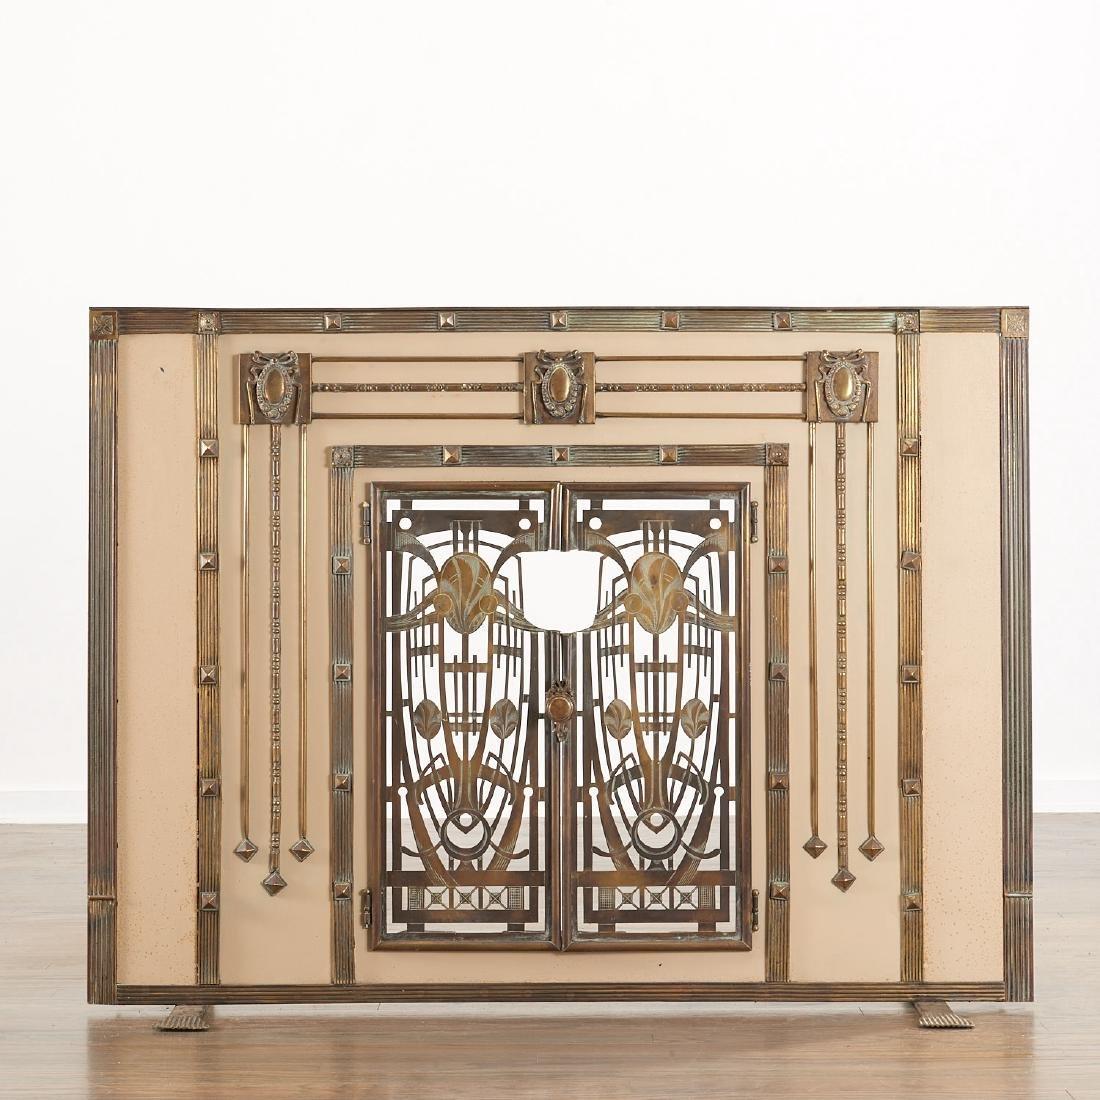 Art Deco fire screen